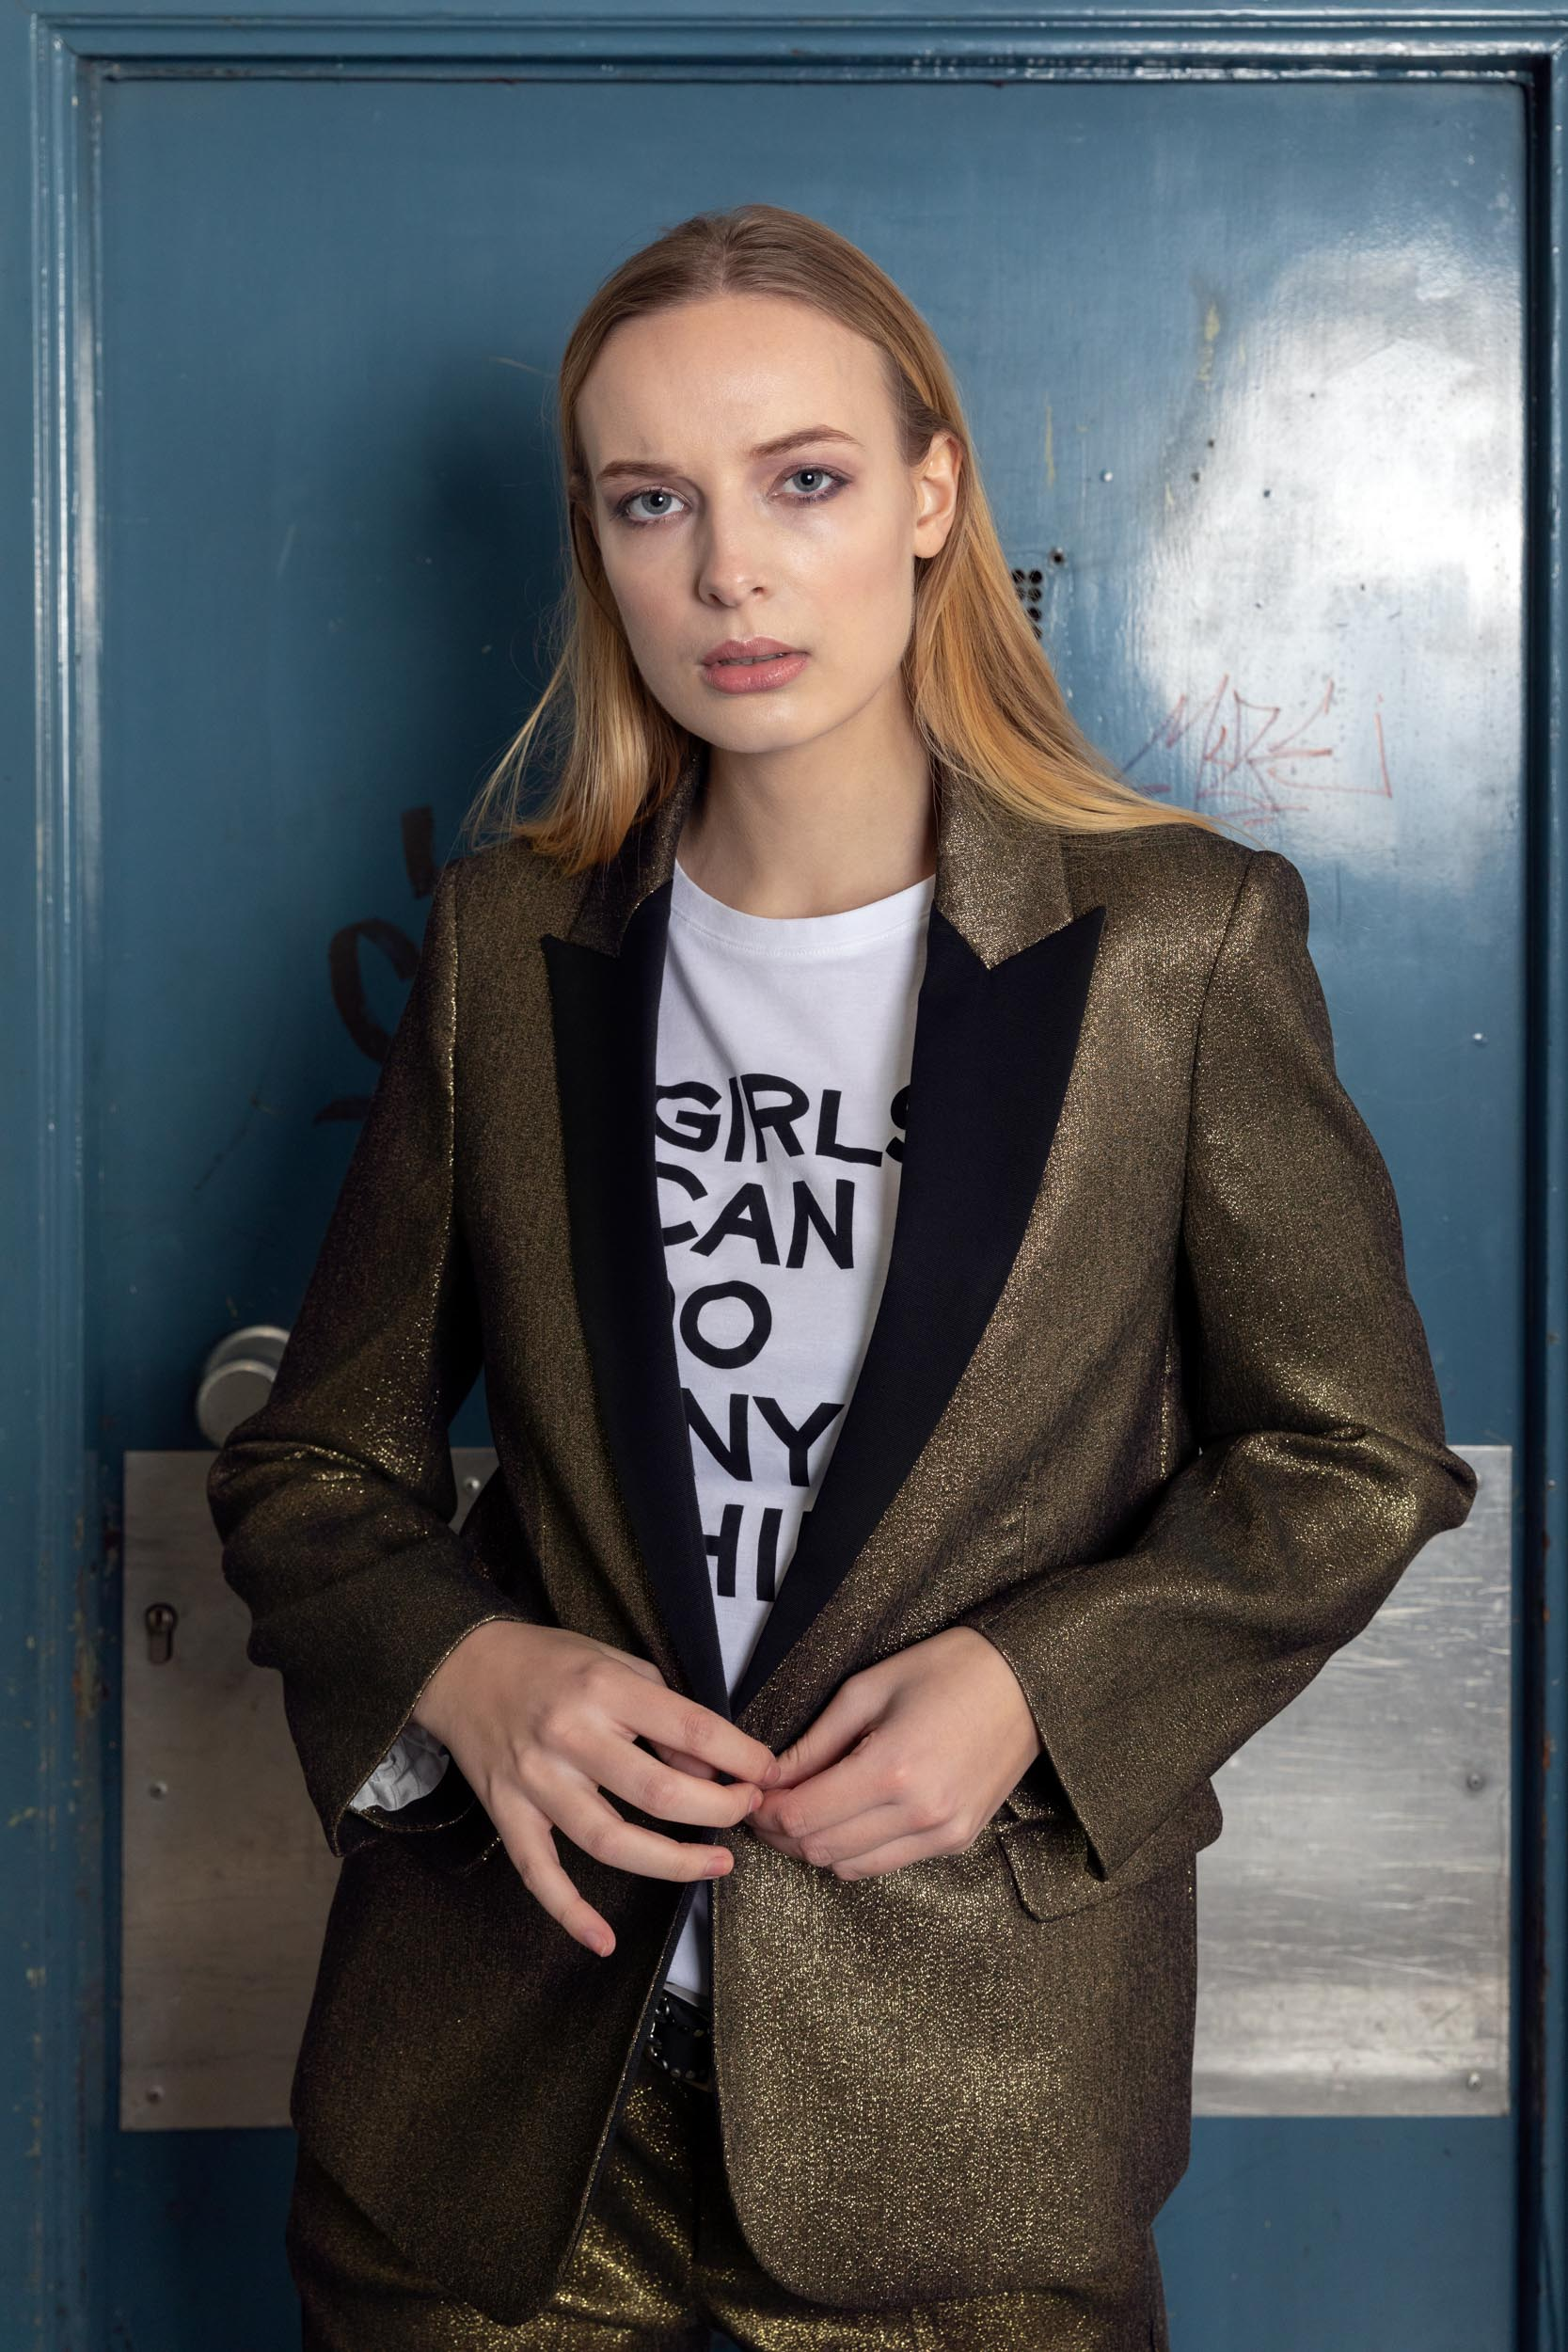 Photo & retouch: Alexis BreugelmansModel: Lauren de Bie from Just Jess ModelsMake-up: Sarah CluyseHair: Imke MelisAssistant: Sara De ClerckClothing: Zadig & Voltaire